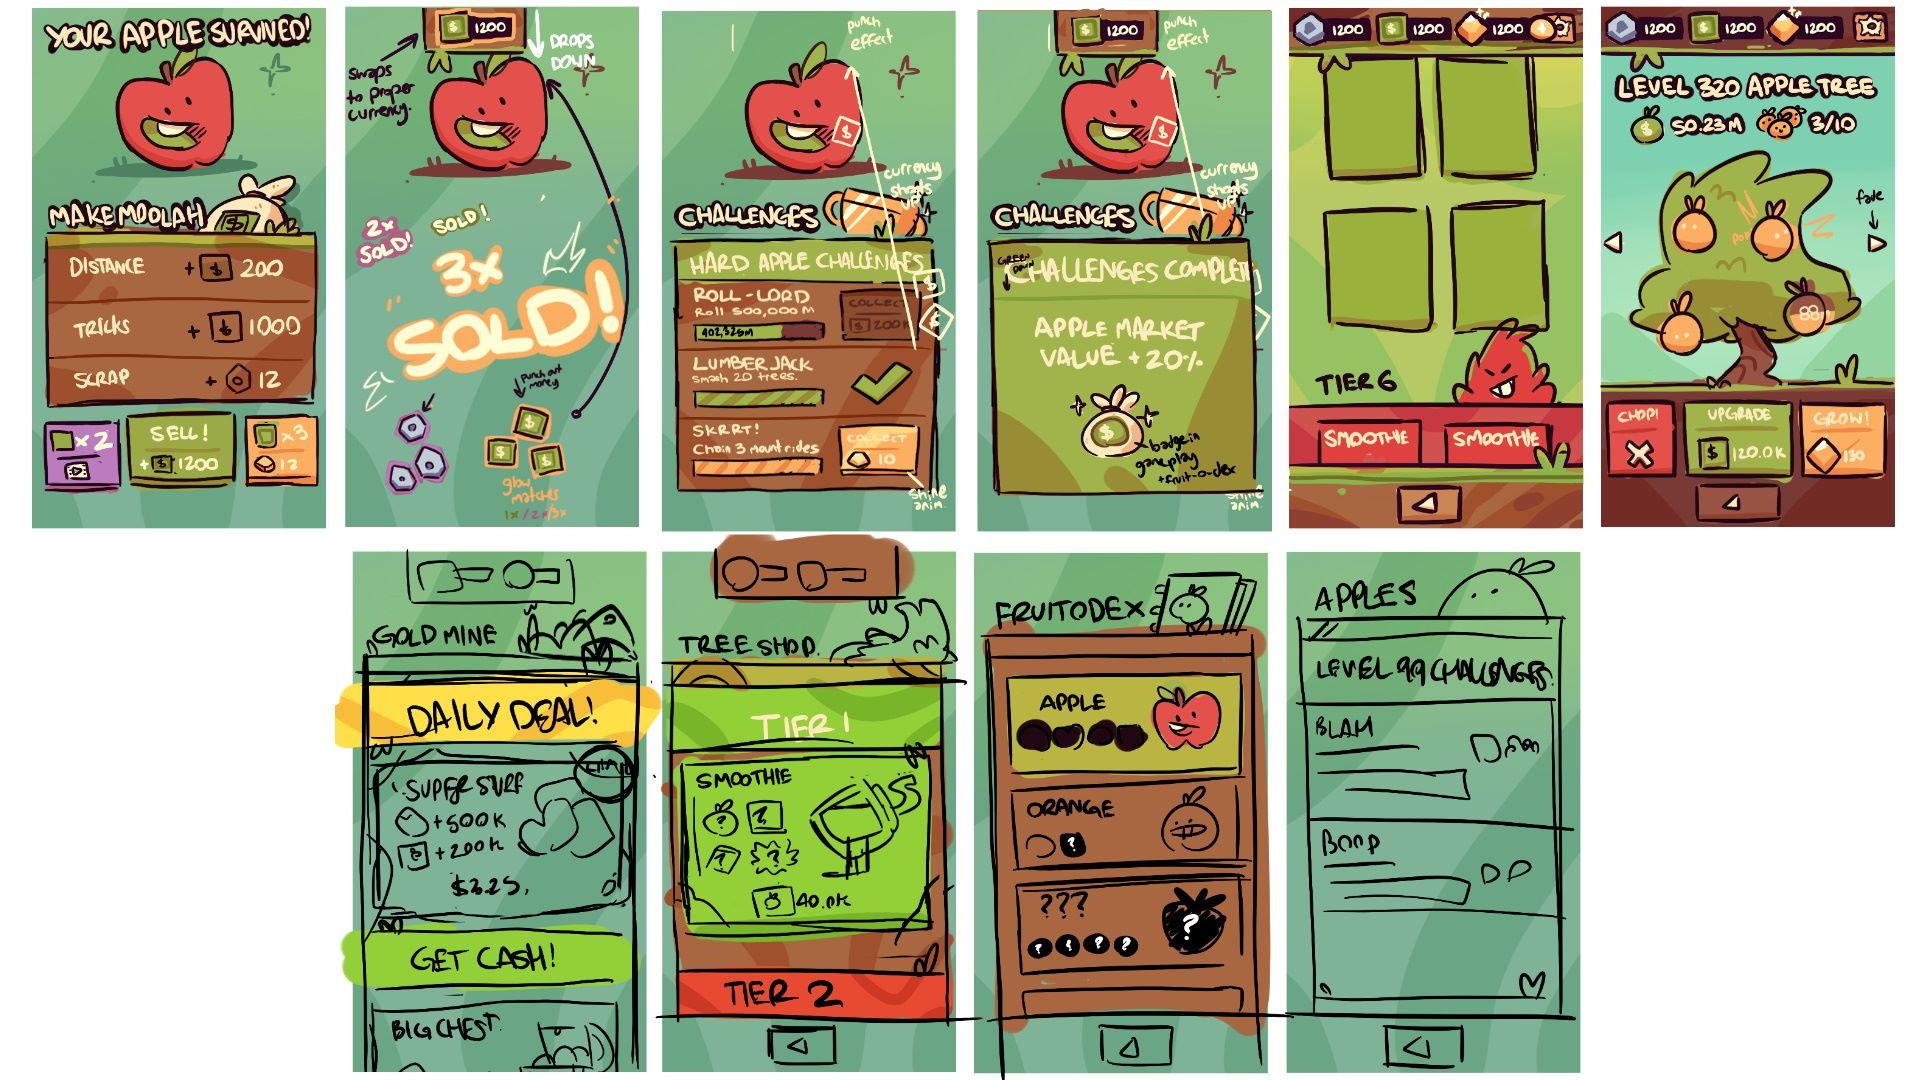 Farm Punks UI concept sketches